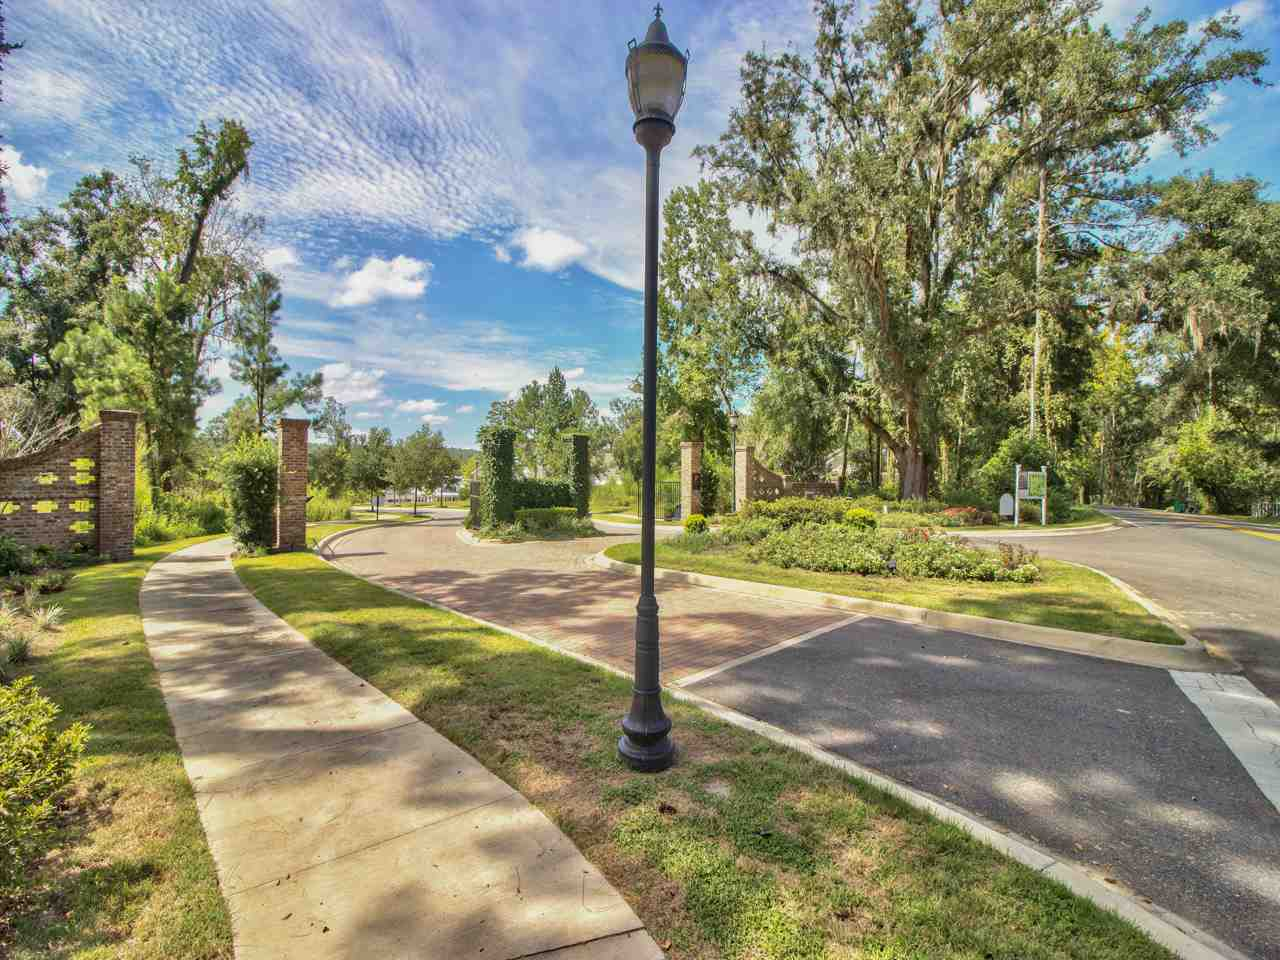 Photo of Lot 6 Rhoden Hill Way, Tallahassee, FL 32312